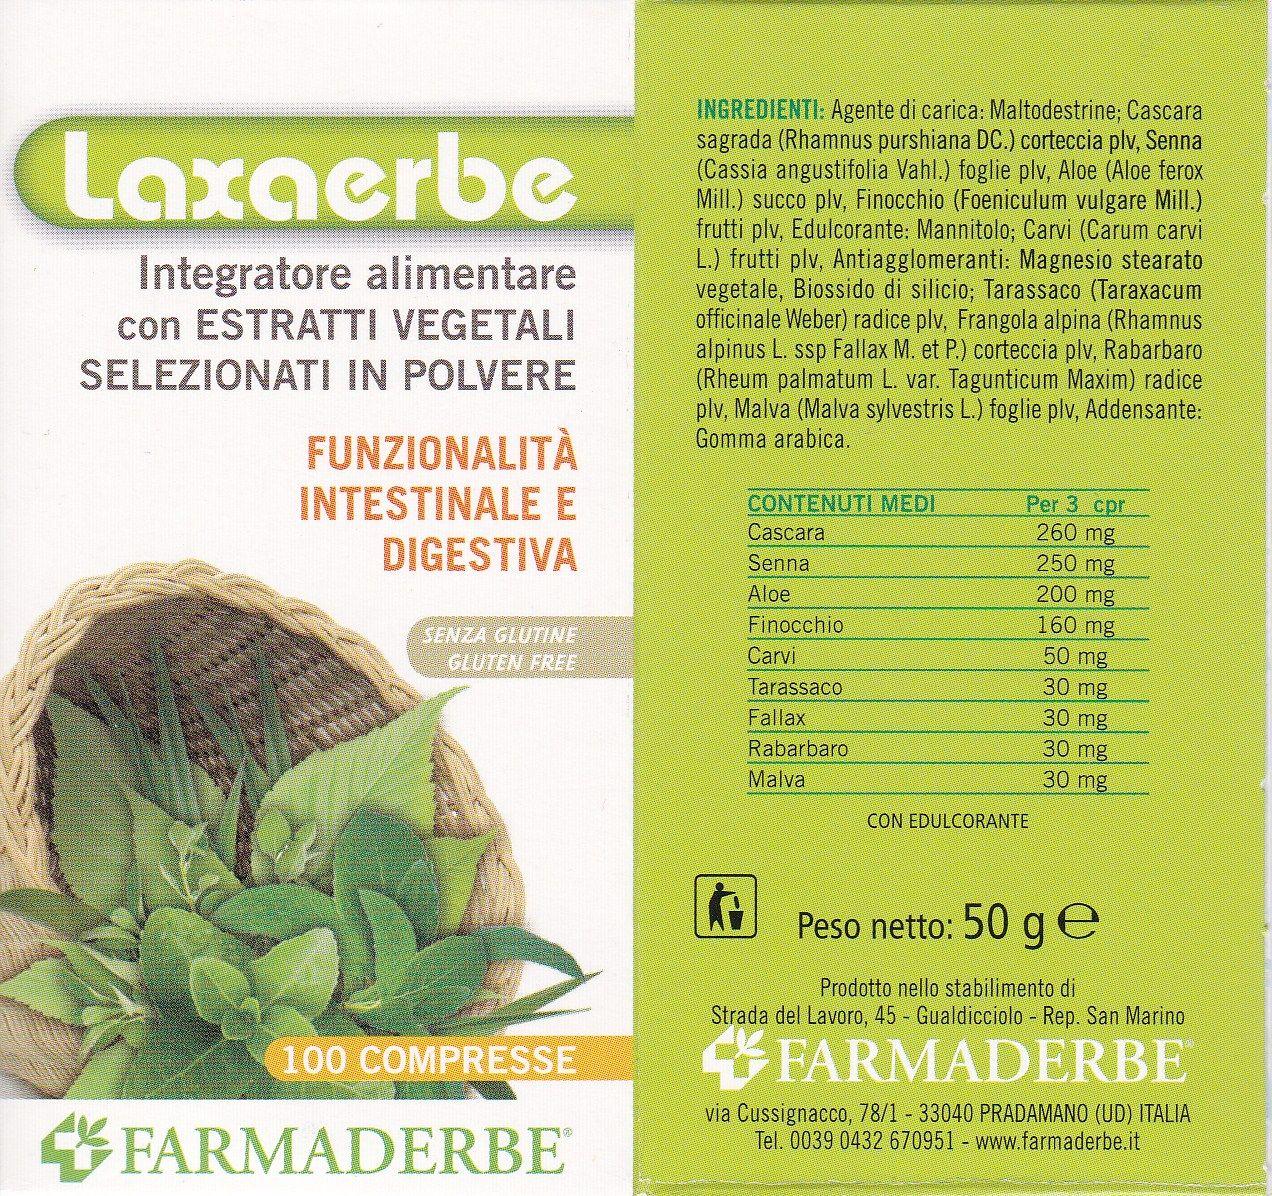 FARMADERBE LAXAERBE 100 cpss